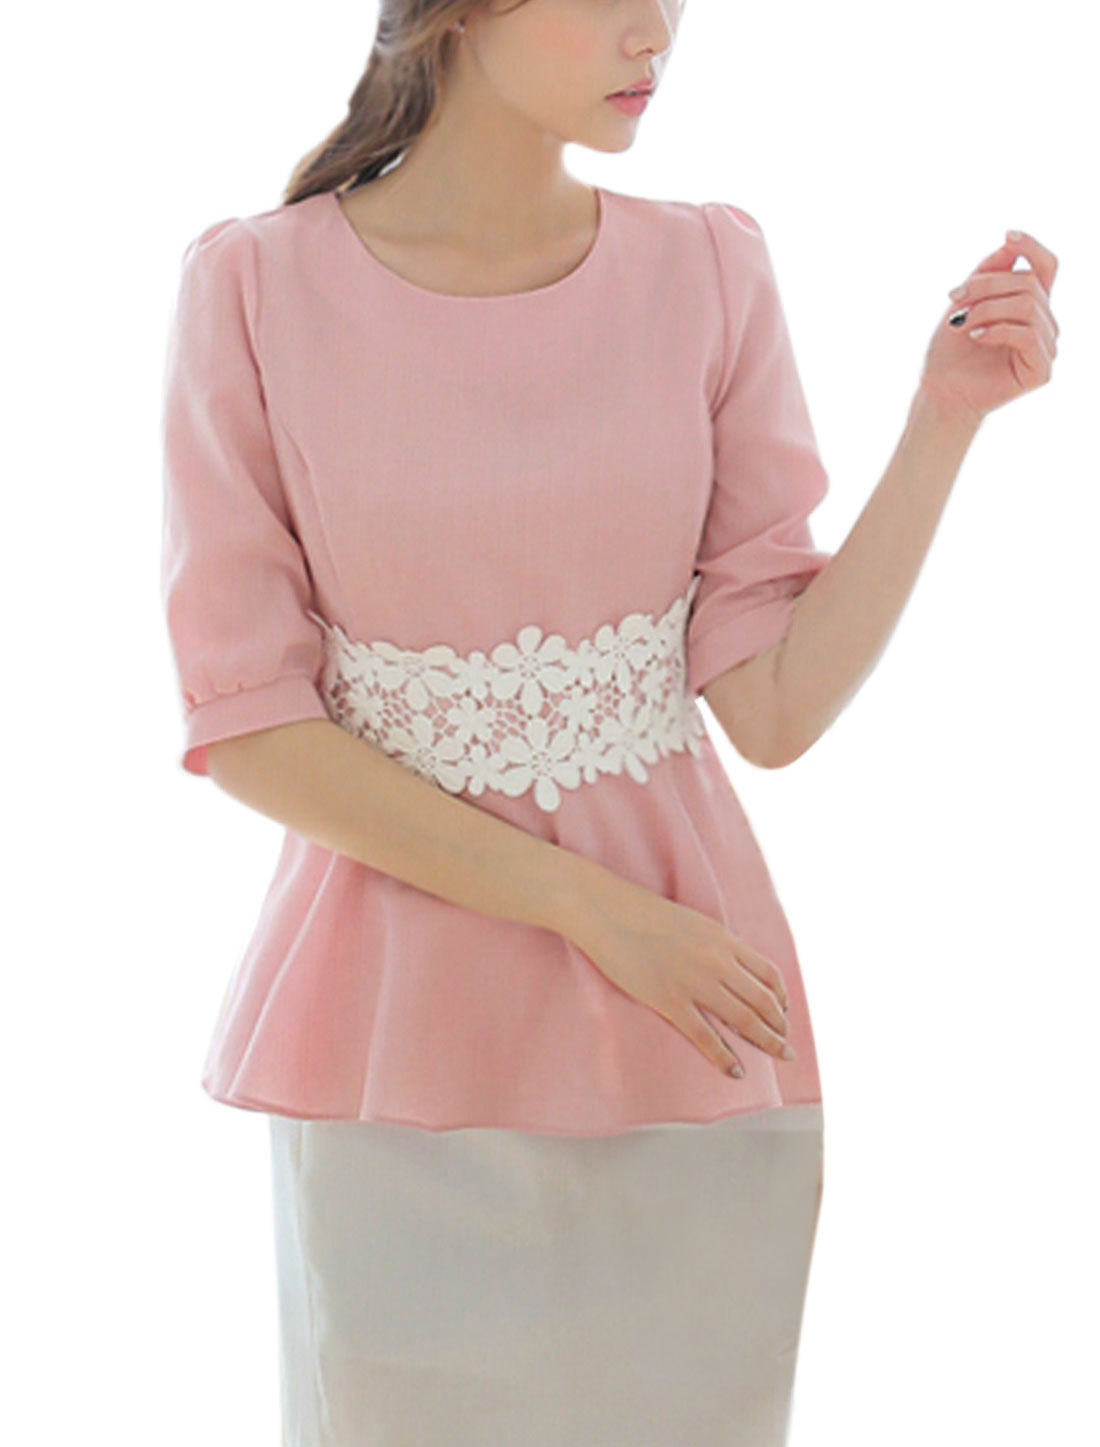 Ladies Floral Design Elbow Sleeves Round Neck Peplum Top Pink XS